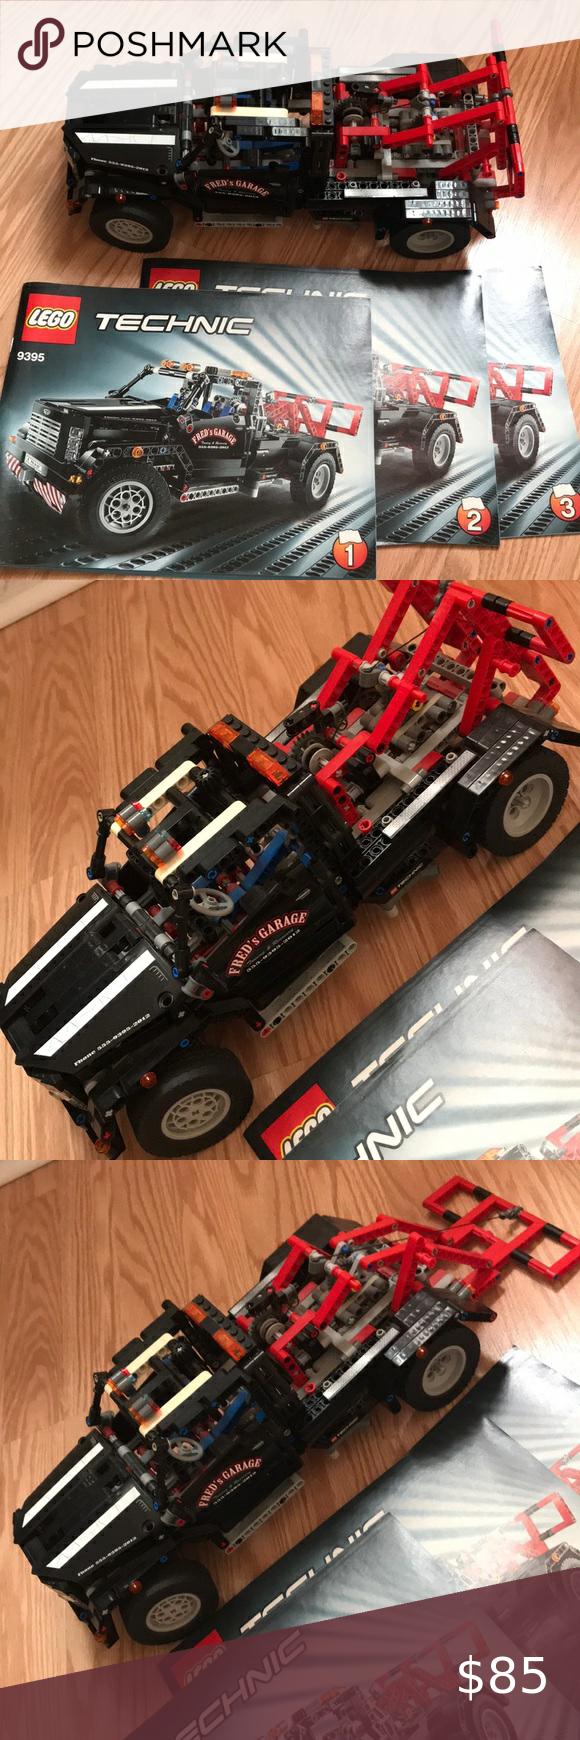 LEGO TECHNIC Tow Truck 9395 in 2020 Lego technic, Tow